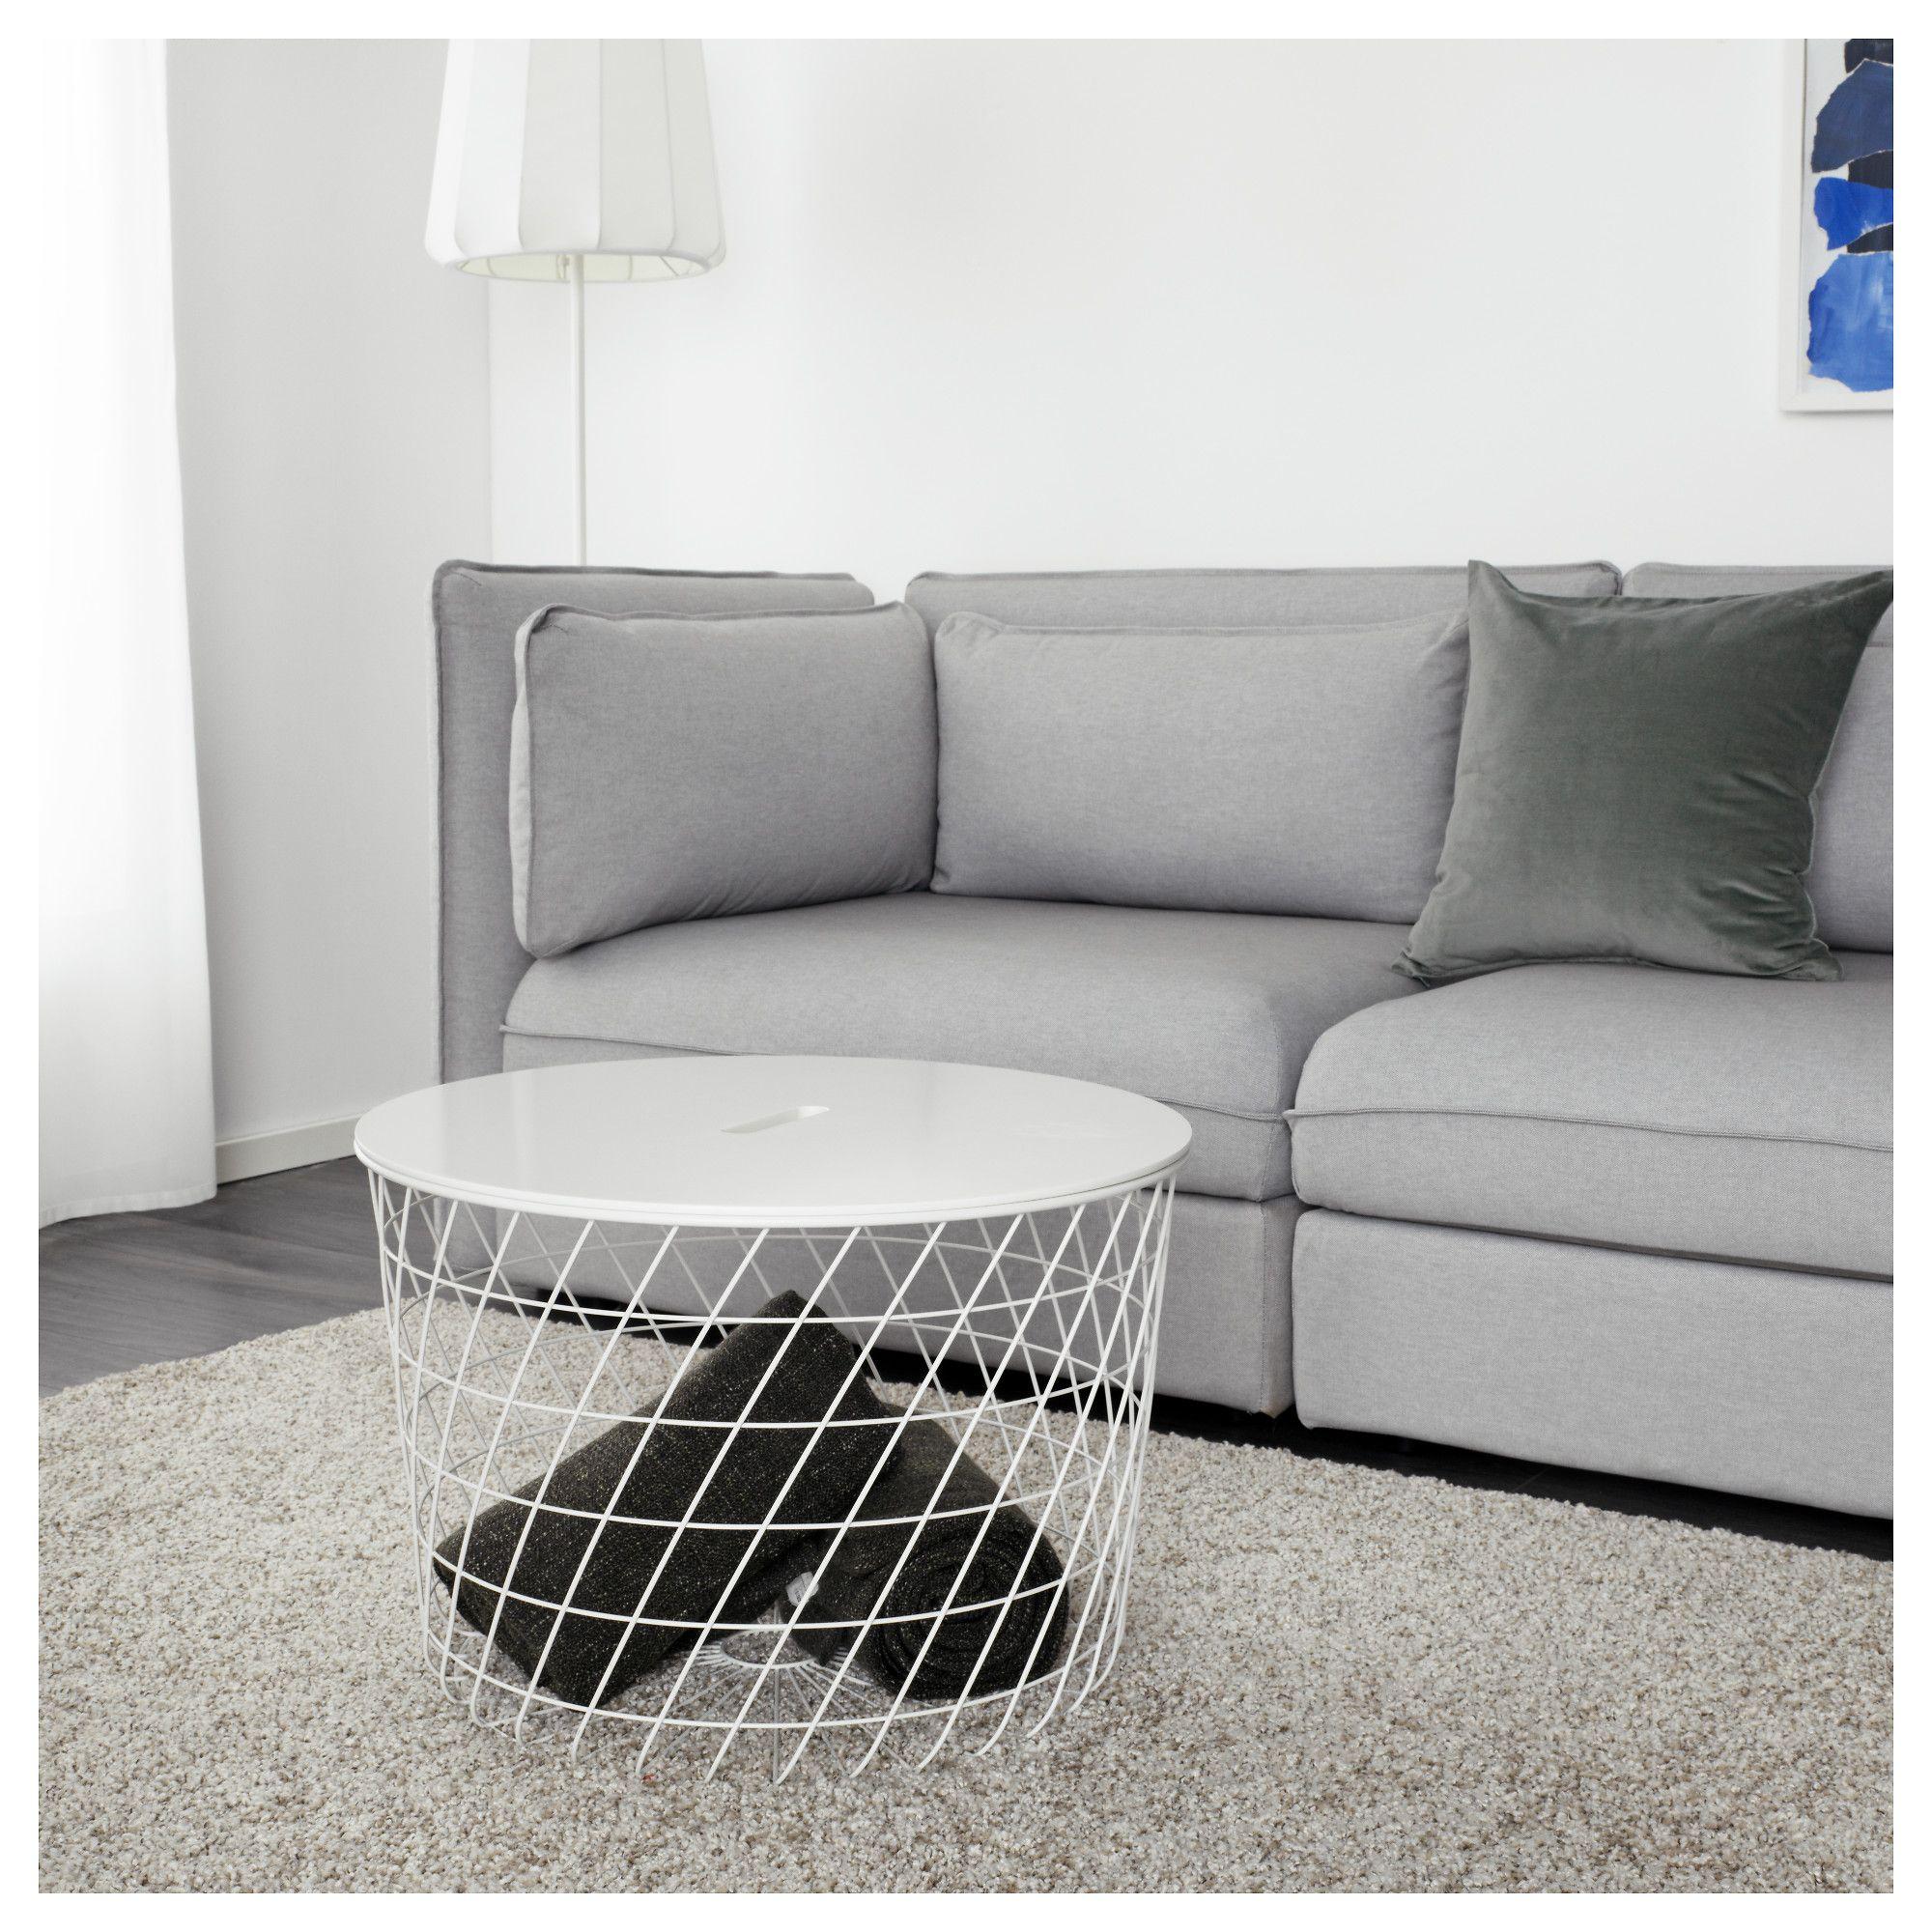 Folding table and chair set ikea ikea hemnes hemnes daybeds ideas - Kvistbro Storage Table White 61 Cm Ikea